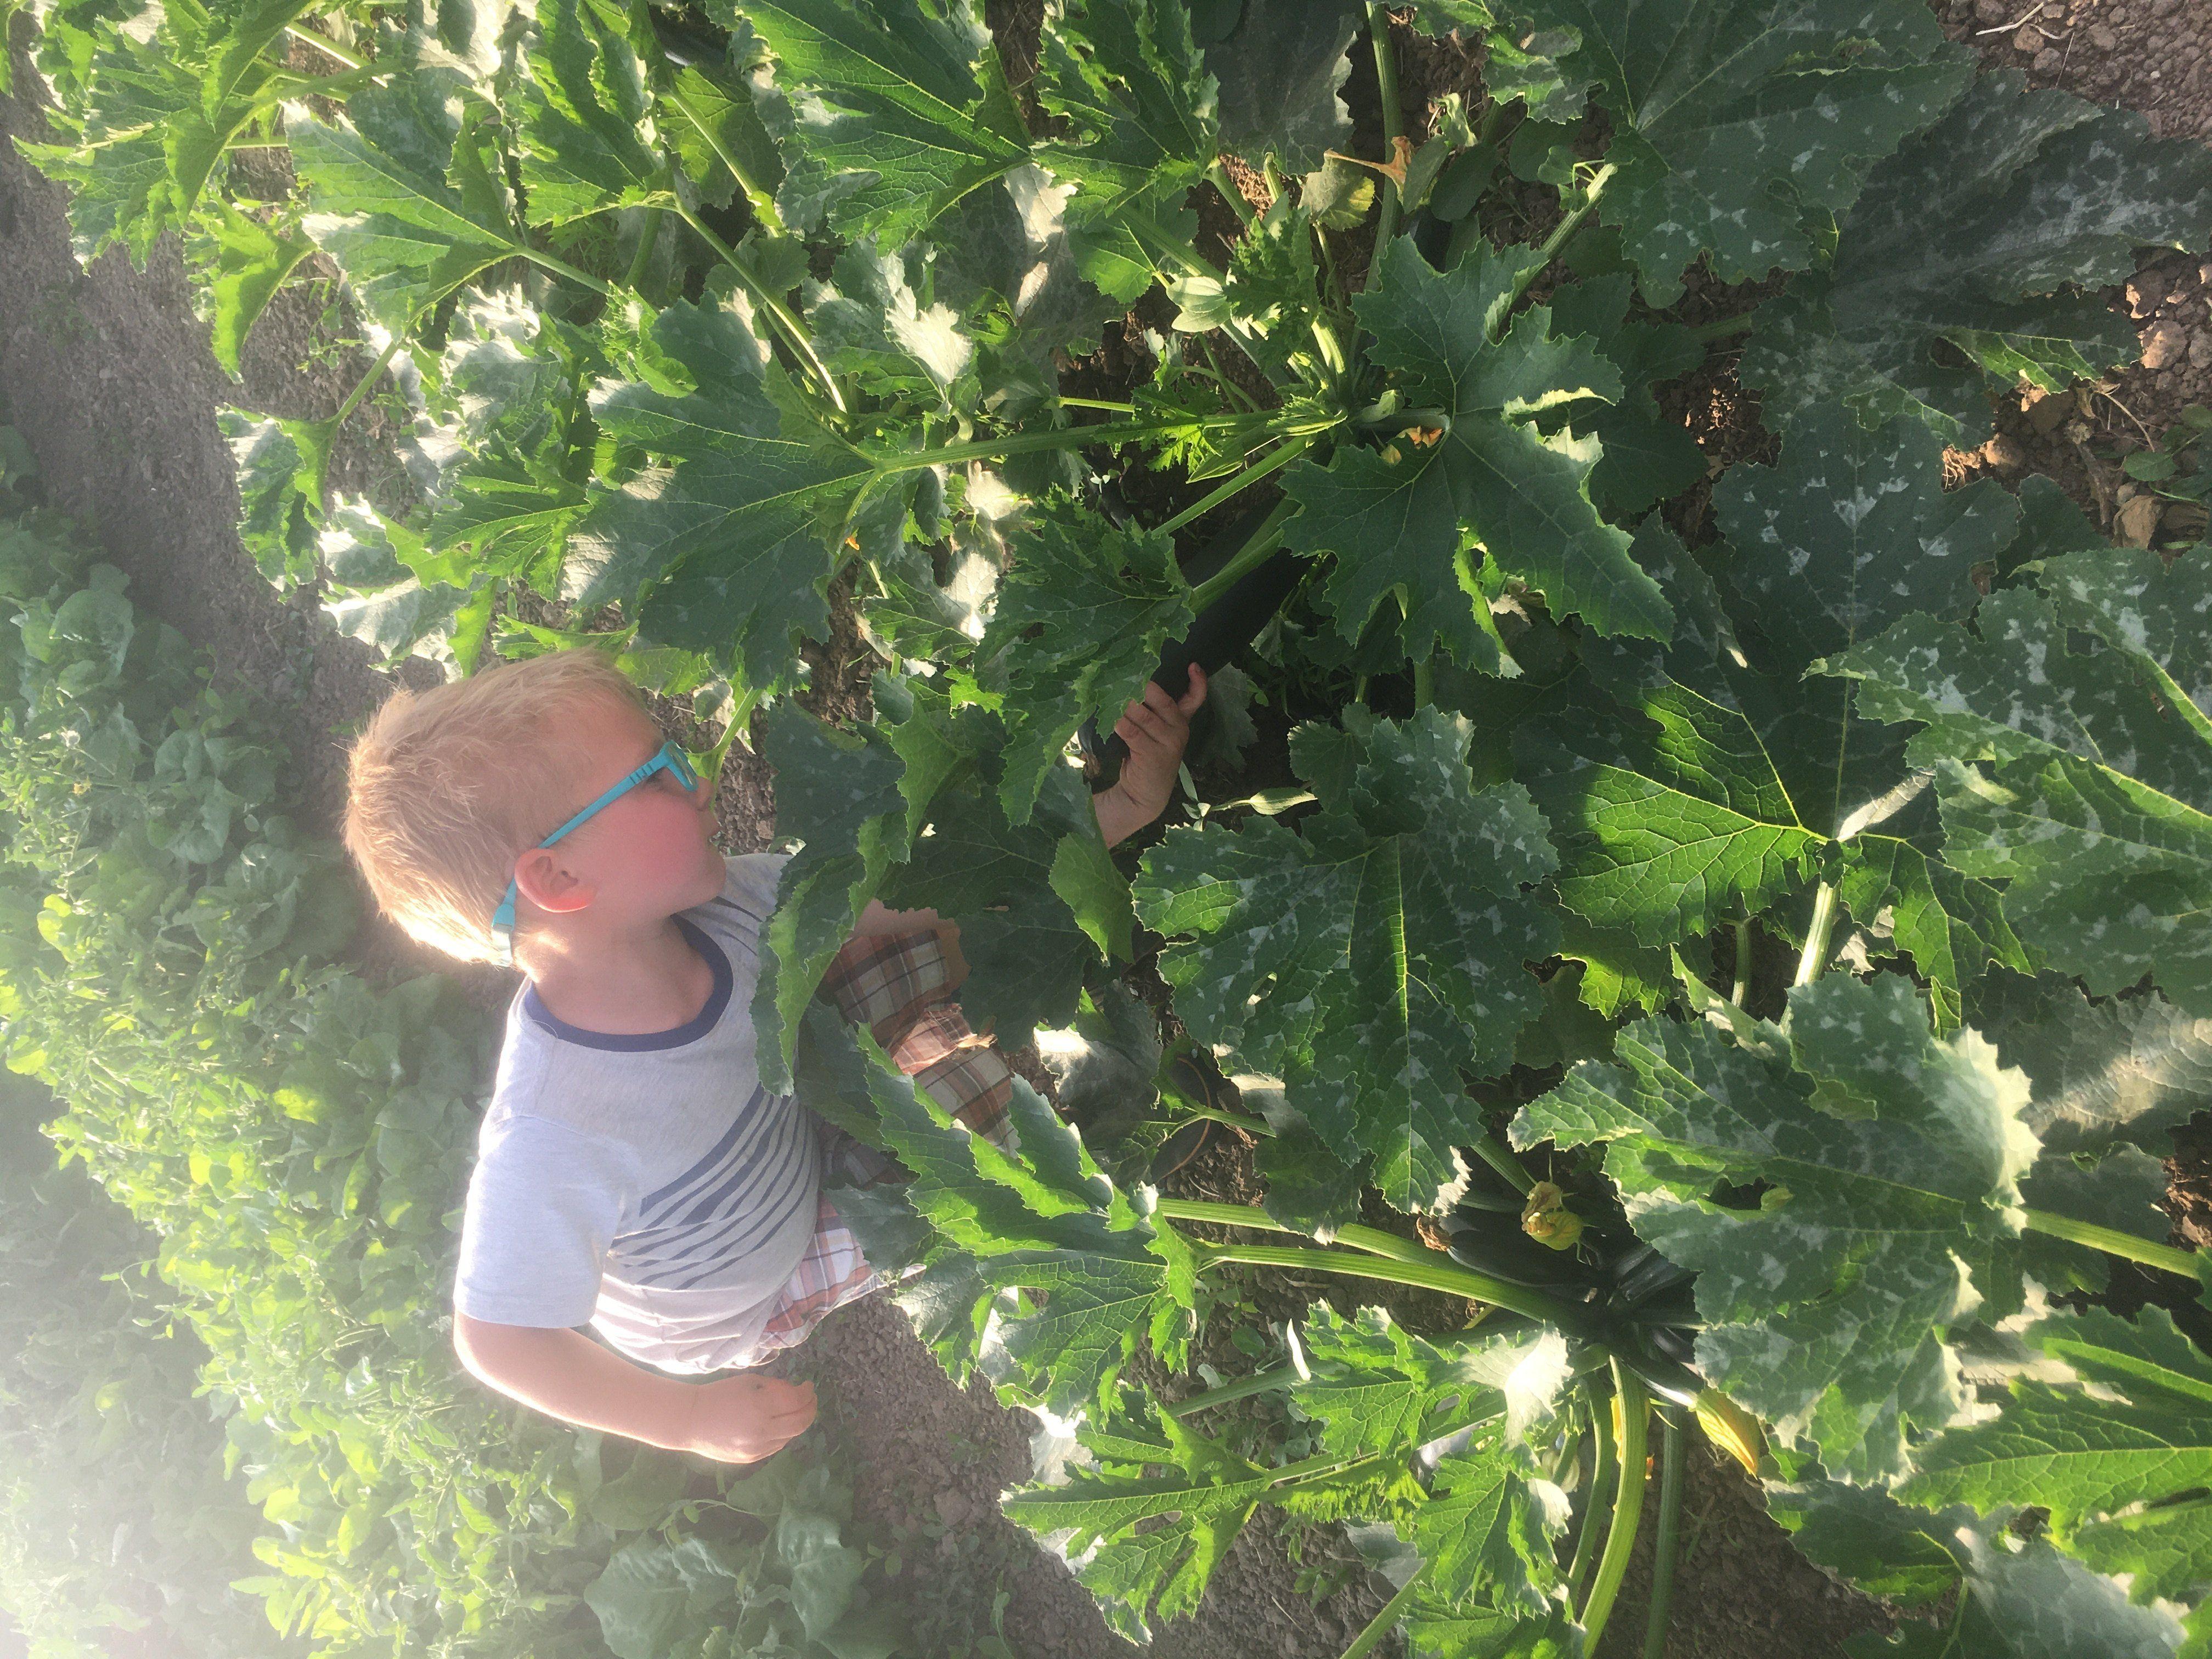 Next Happening: Farm Happenings for June 1, 2020